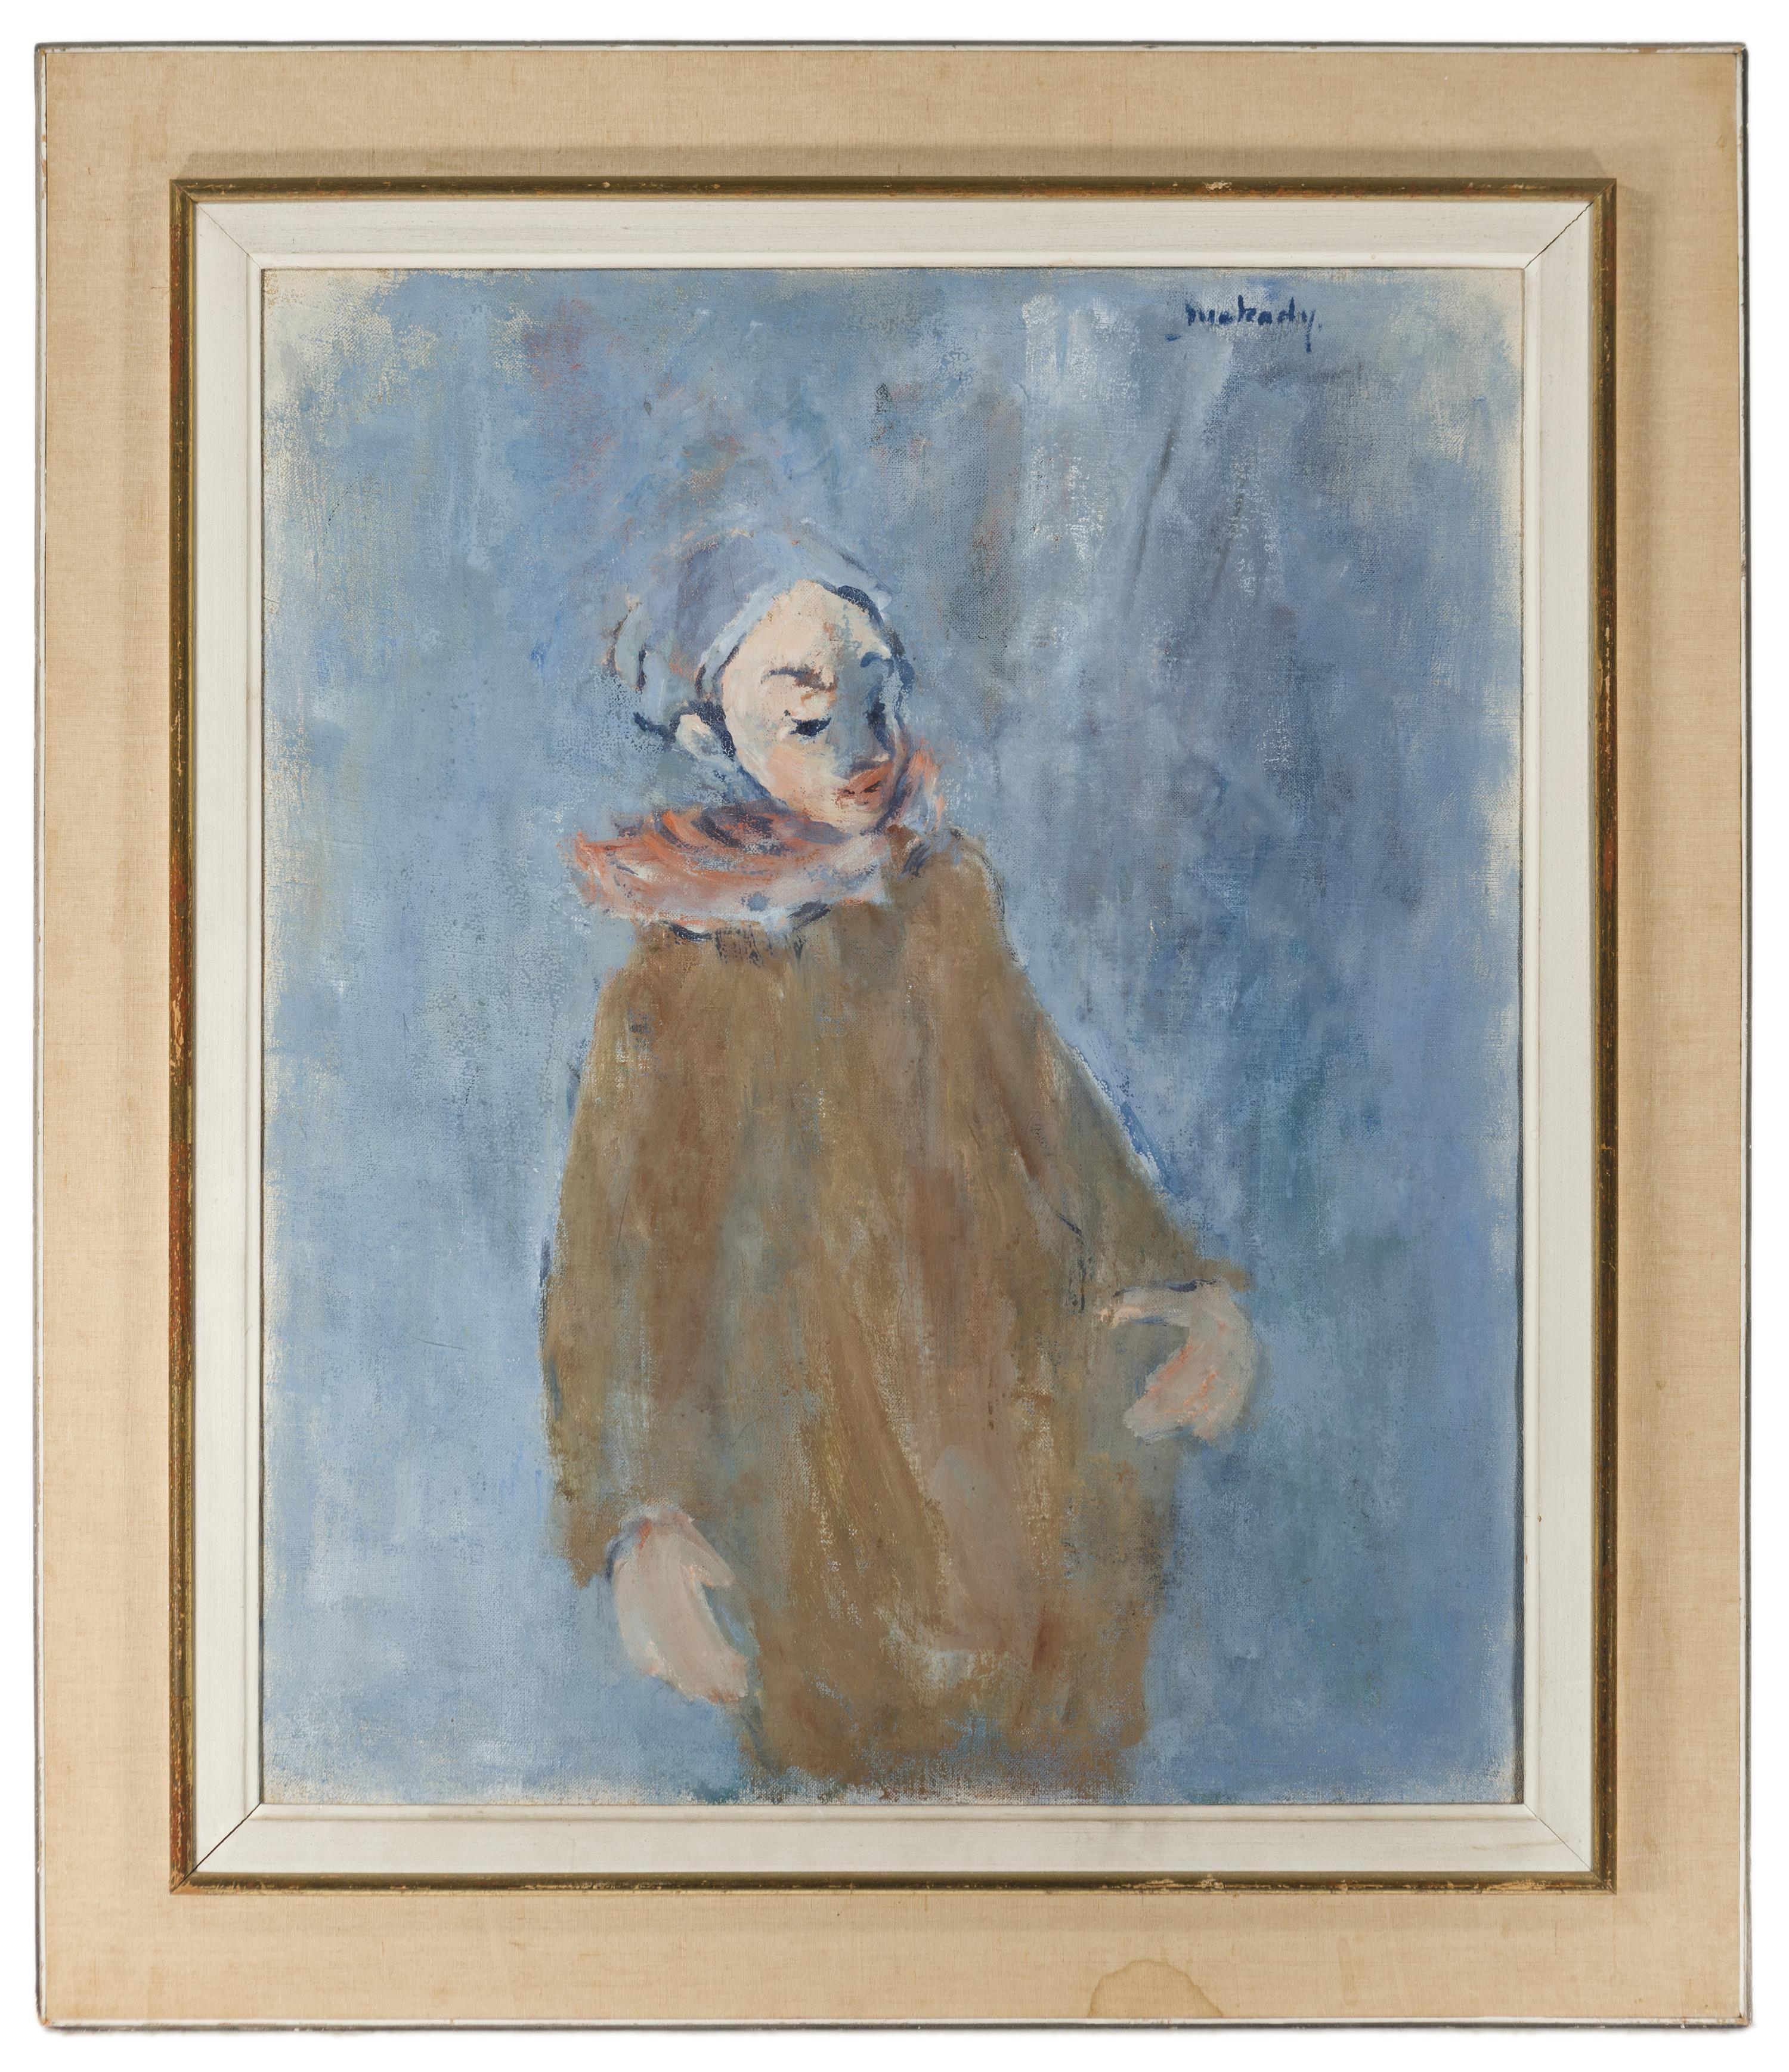 "Moshe Mokady, (1902-1975 Israeli), Portrait of a boy in a hat, Oil on canvas, 28.75"" H x 23.5"" W"